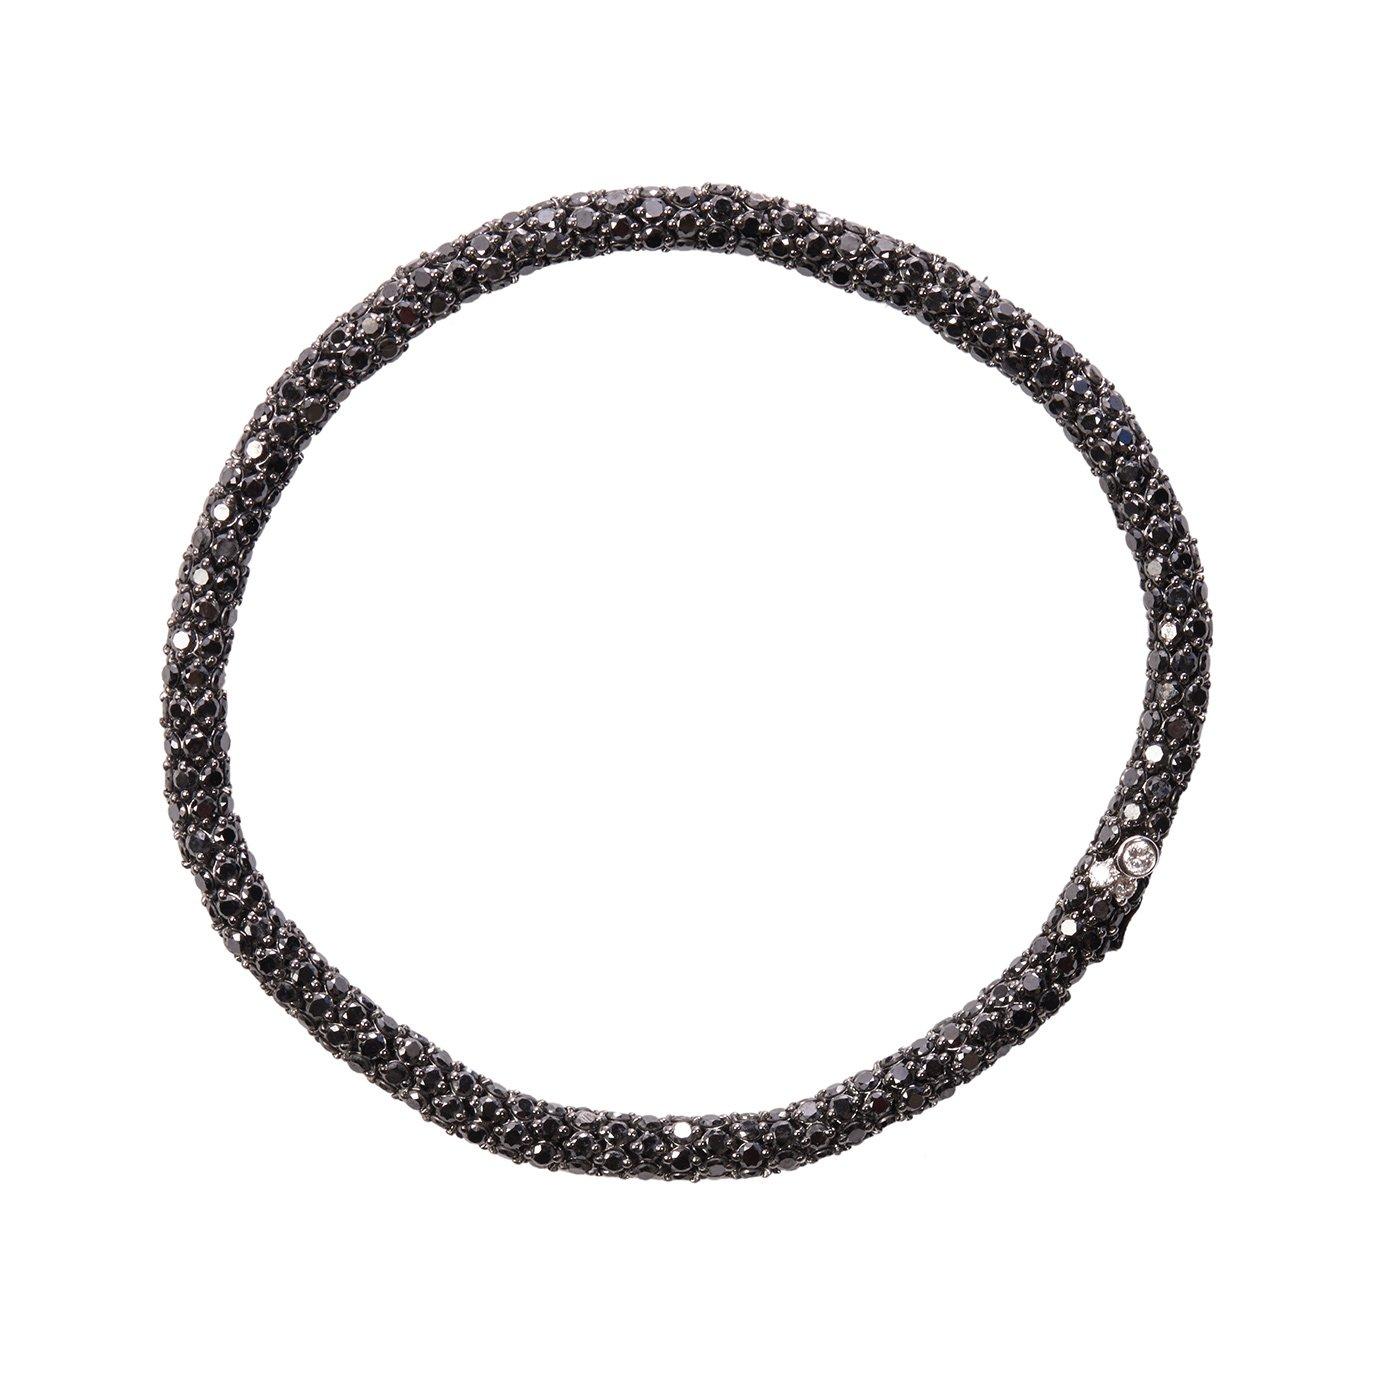 Mens-Collection_-Black-DIamond-Rope-Bracelet_-18k-White-Gold-with-Black-Diamonds_-_16_000_2560x.progressive.jpg